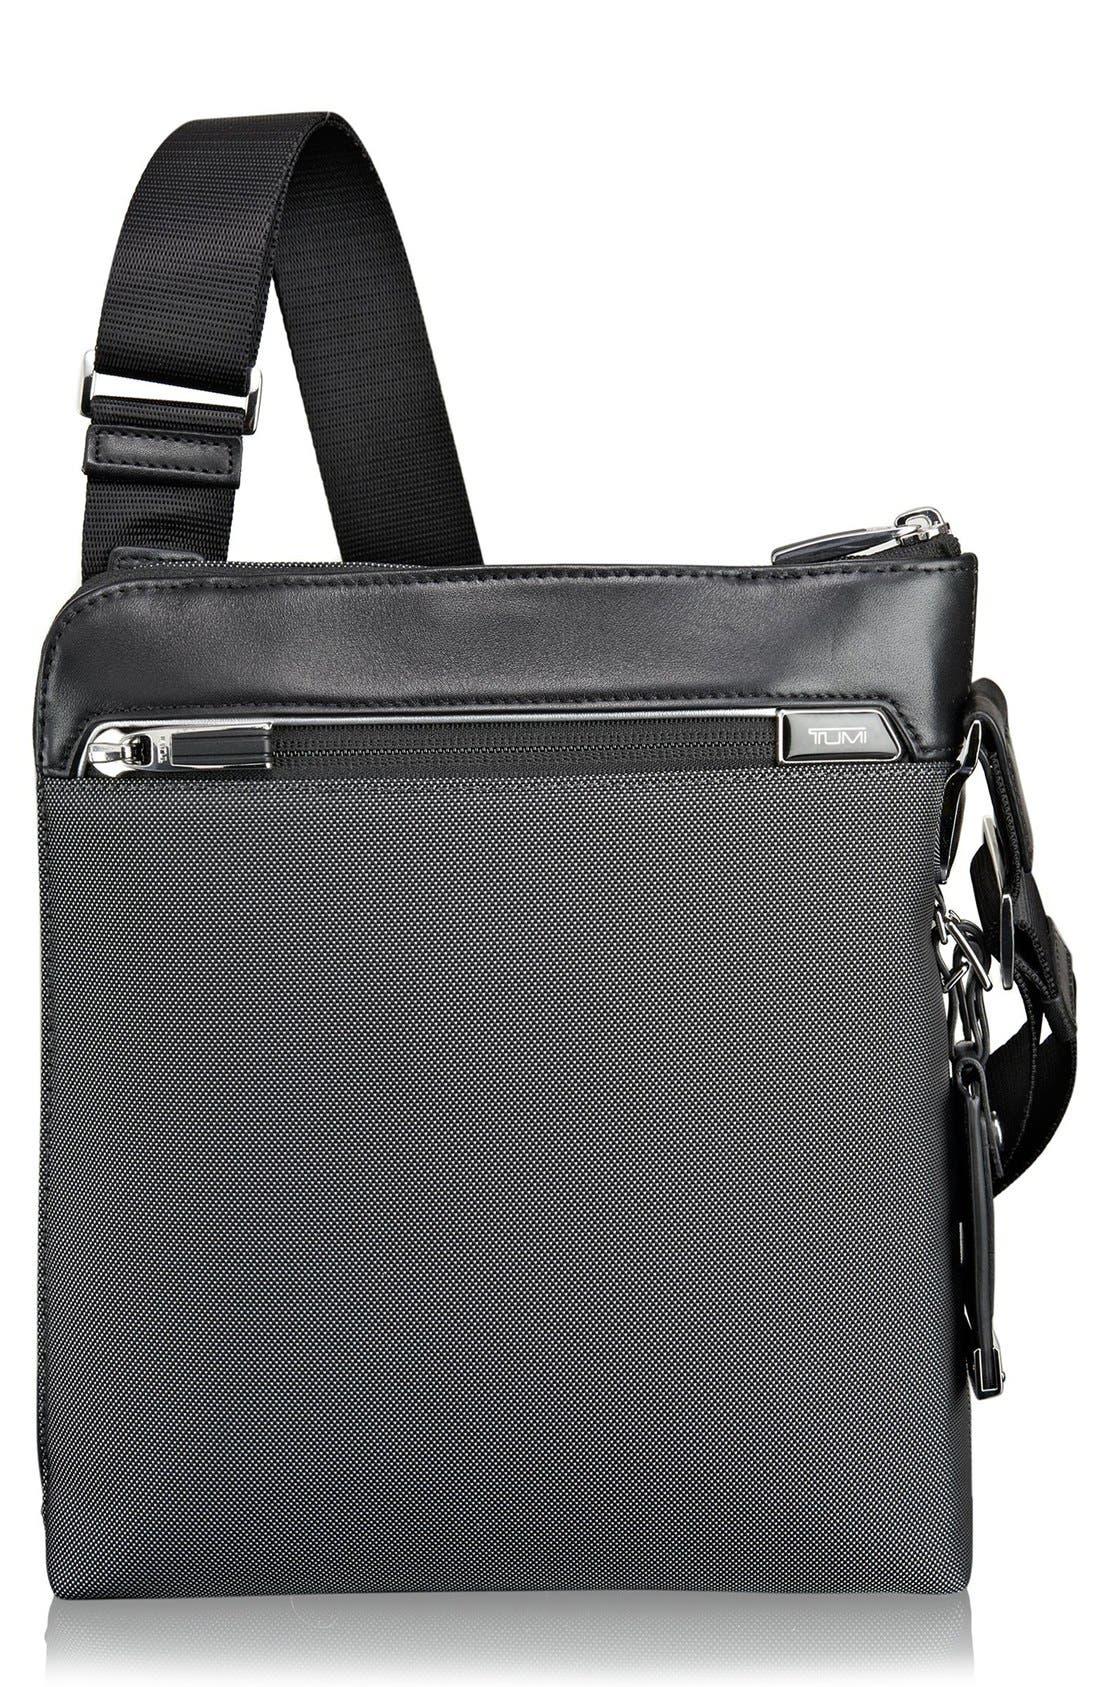 TUMI Arrivé - Owen Crossbody Bag, Main, color, 041